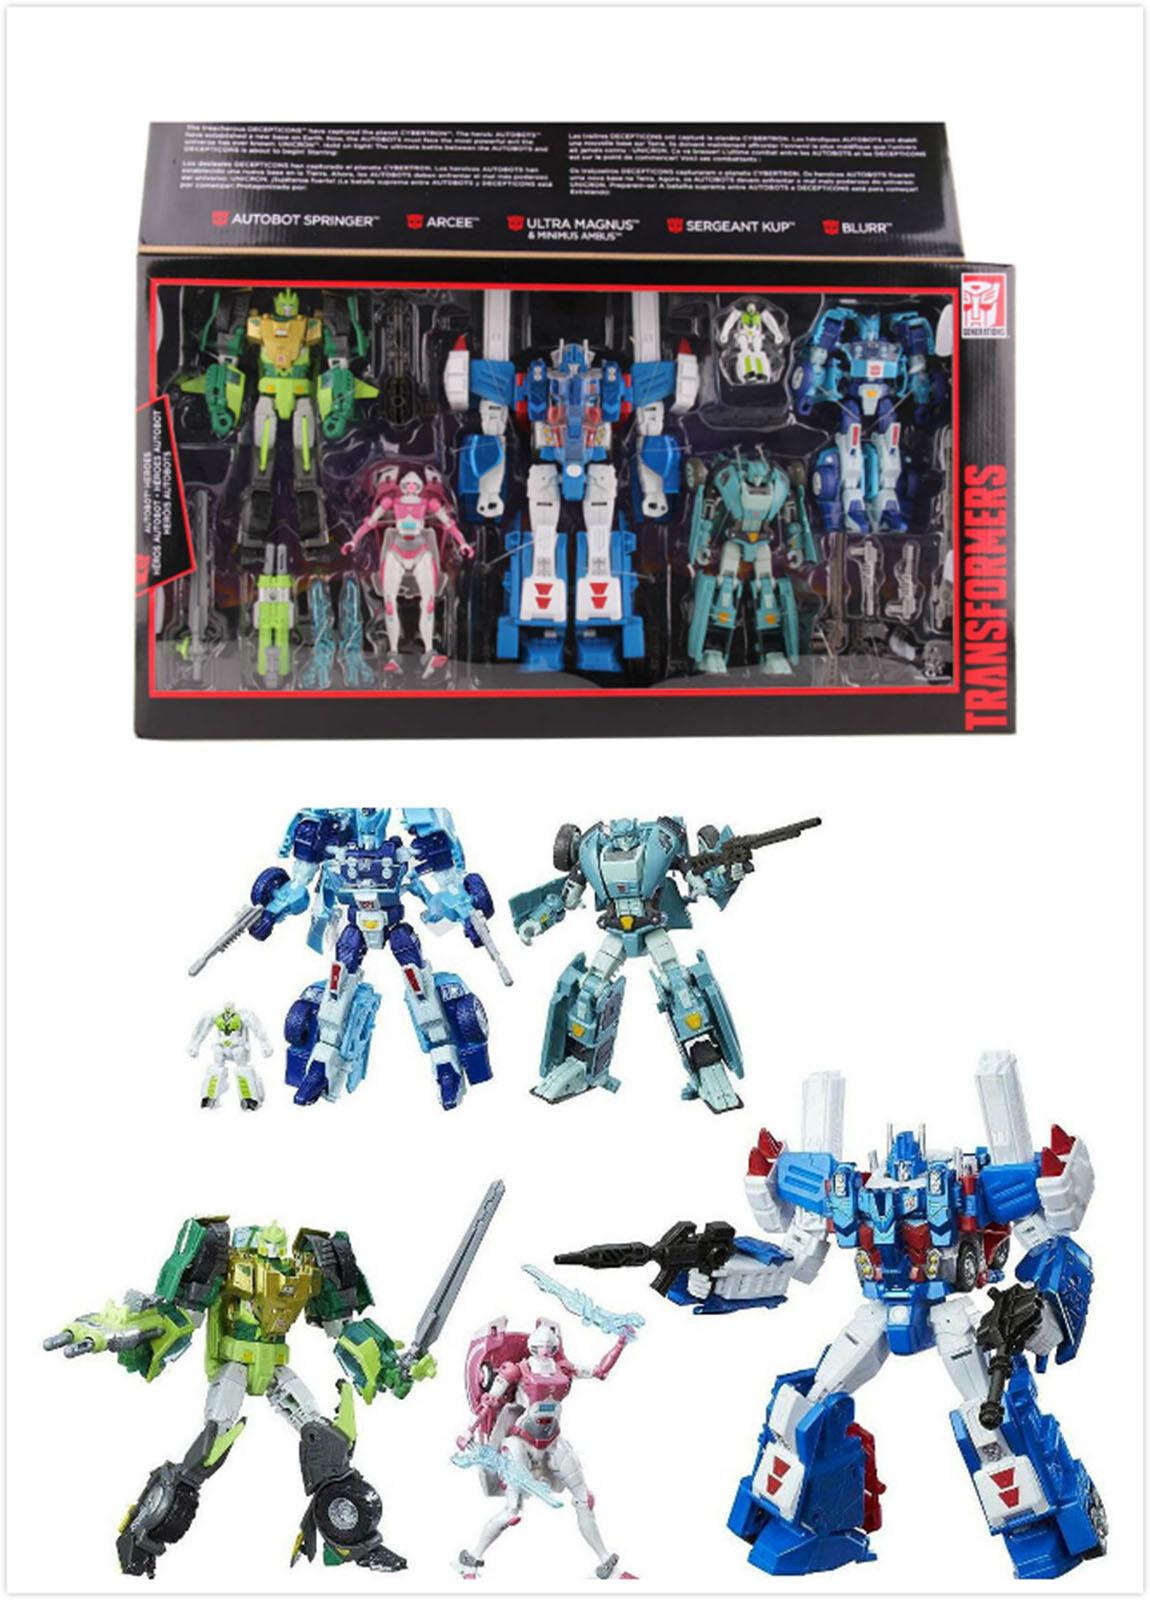 Regalo Transformers G1 Platinum Edition AUTOBOT HEROES Ultra Magnus Springer Kid